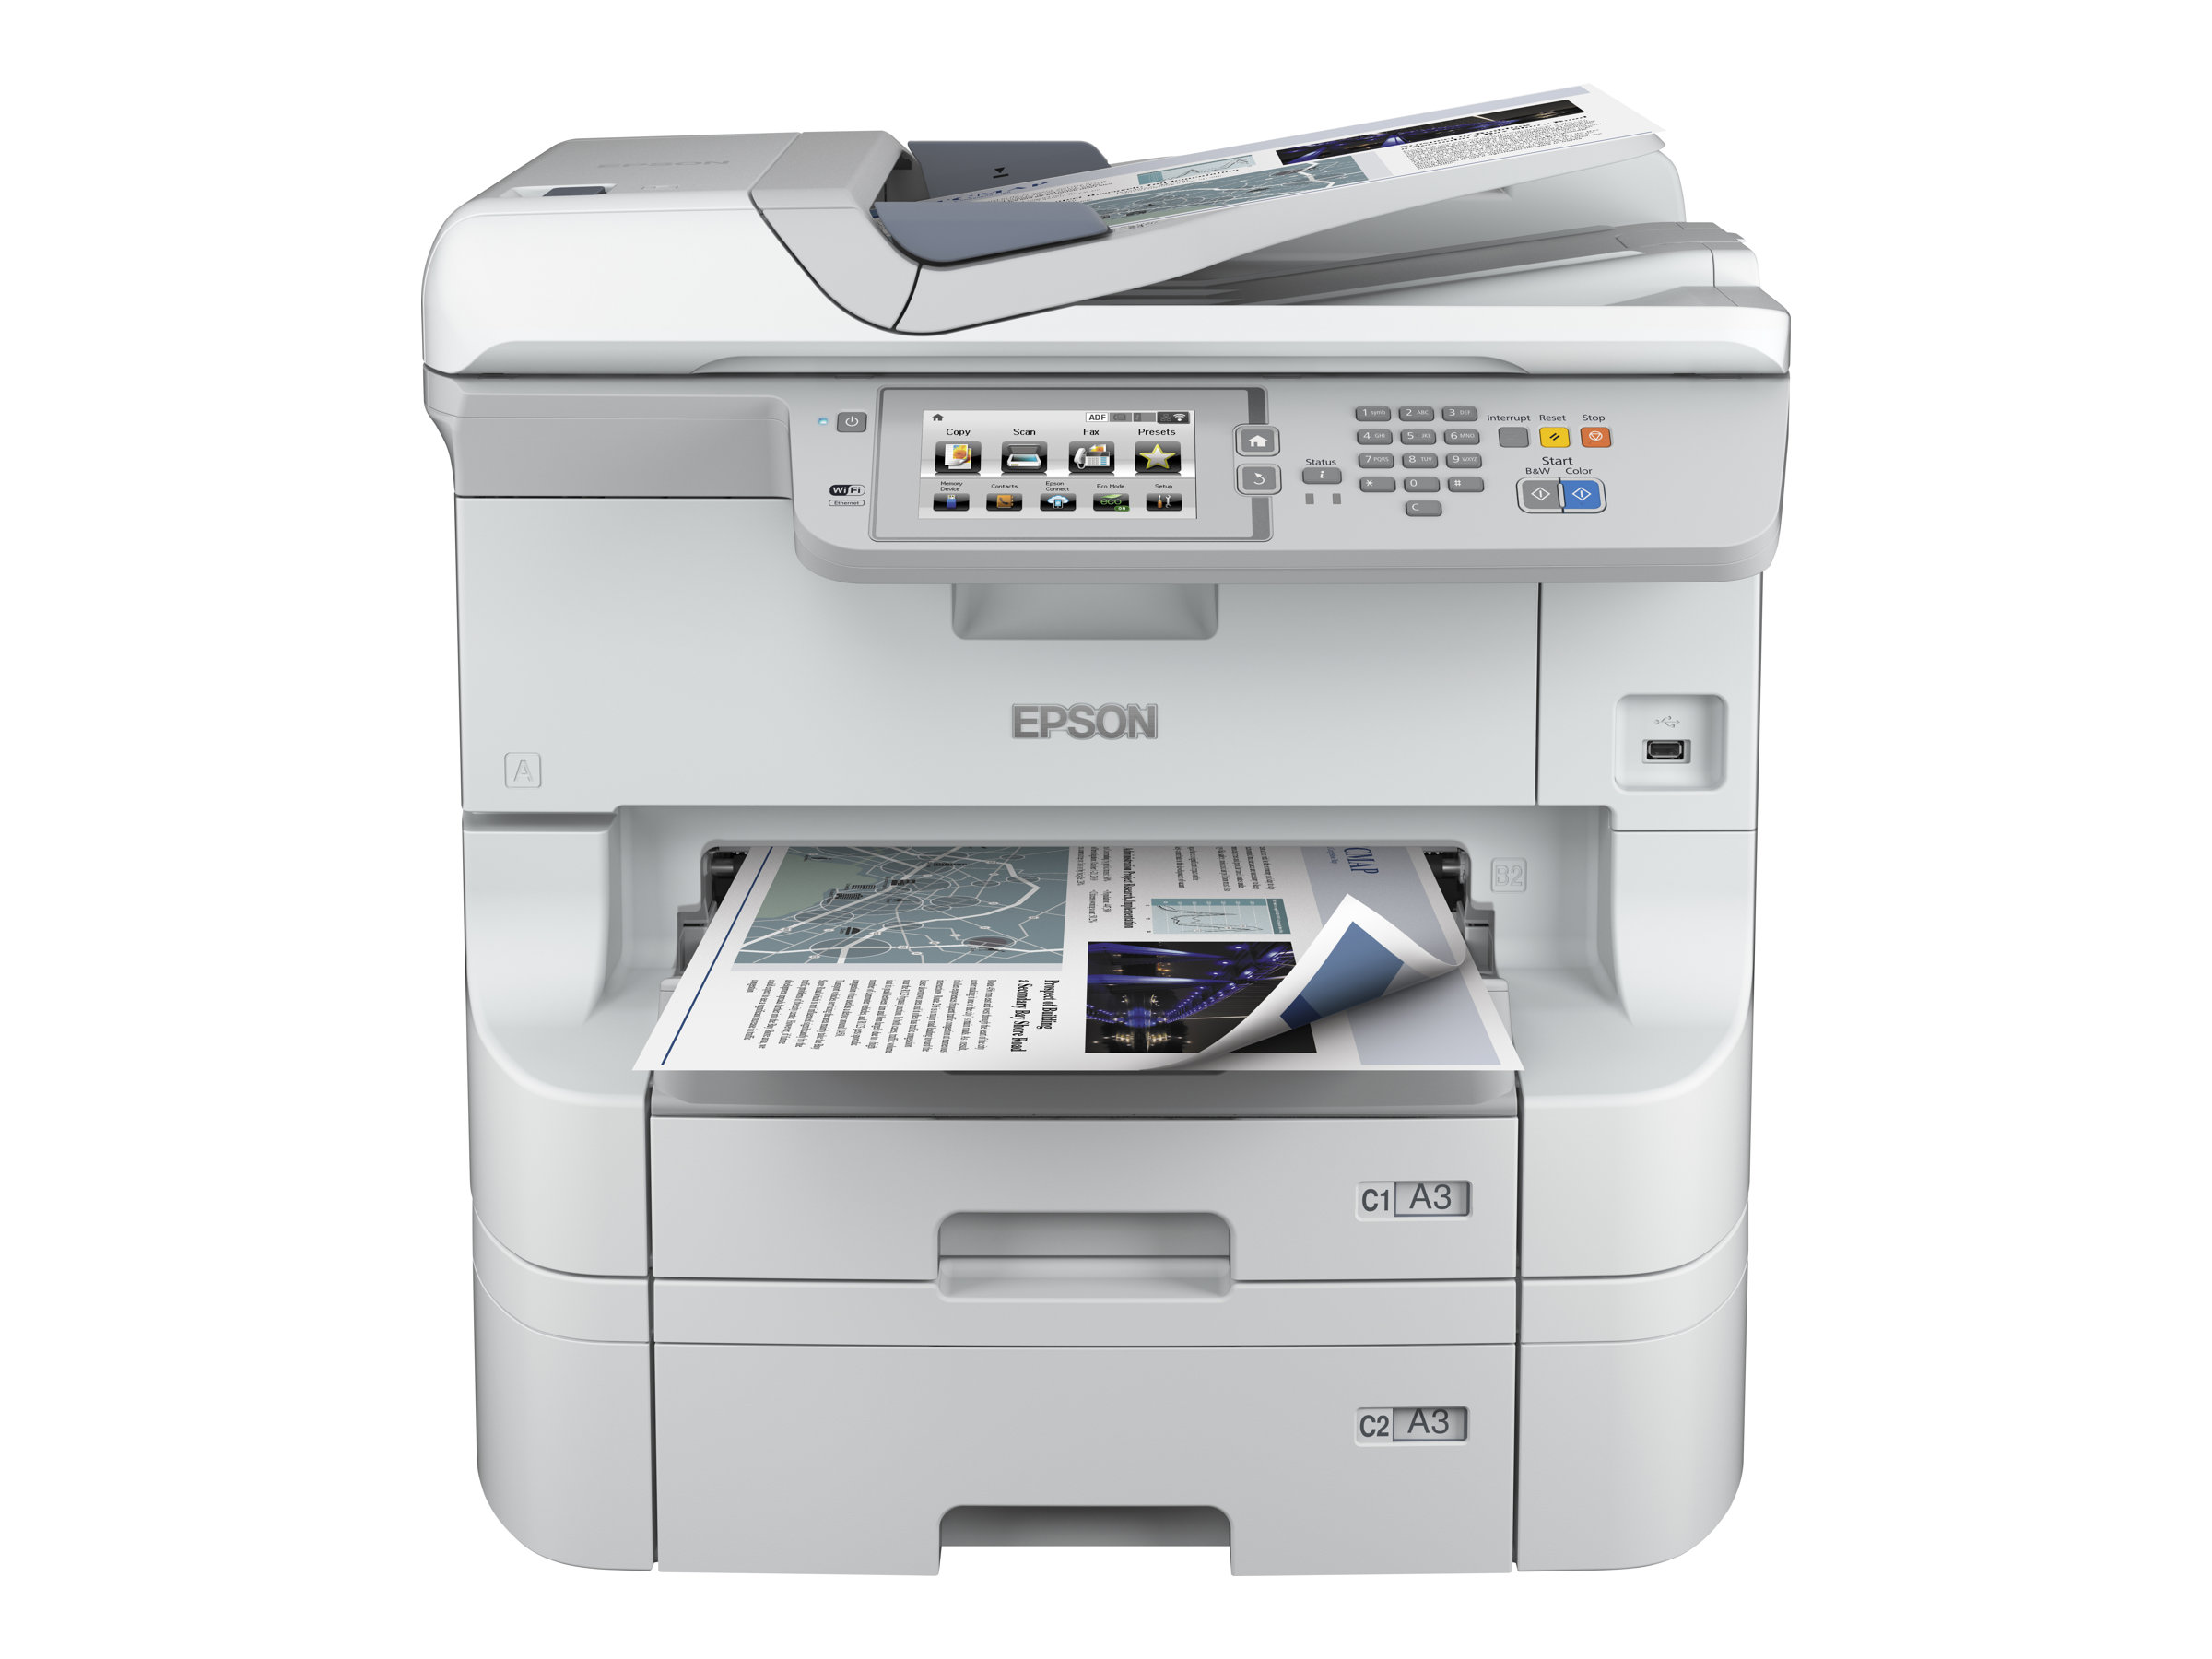 Epson WorkForce Pro WF-8590 DTWF - Multifunktionsdrucker - Farbe - Tintenstrahl - A3 (297 x 420 mm) (Original) - A3 (Medien)